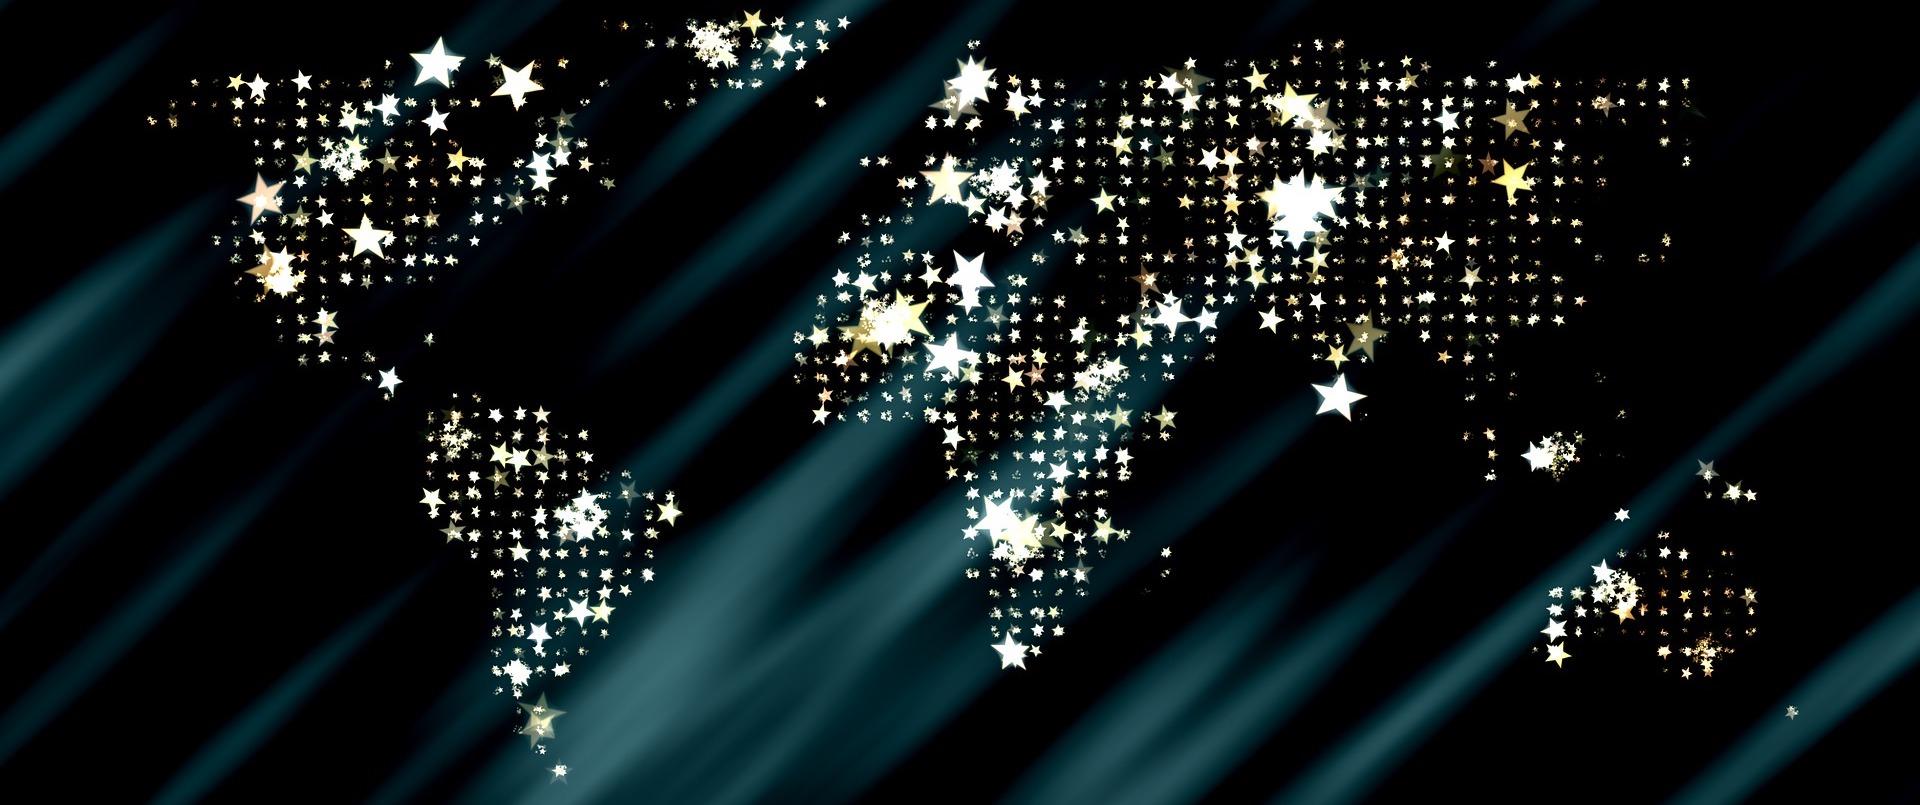 World in stars